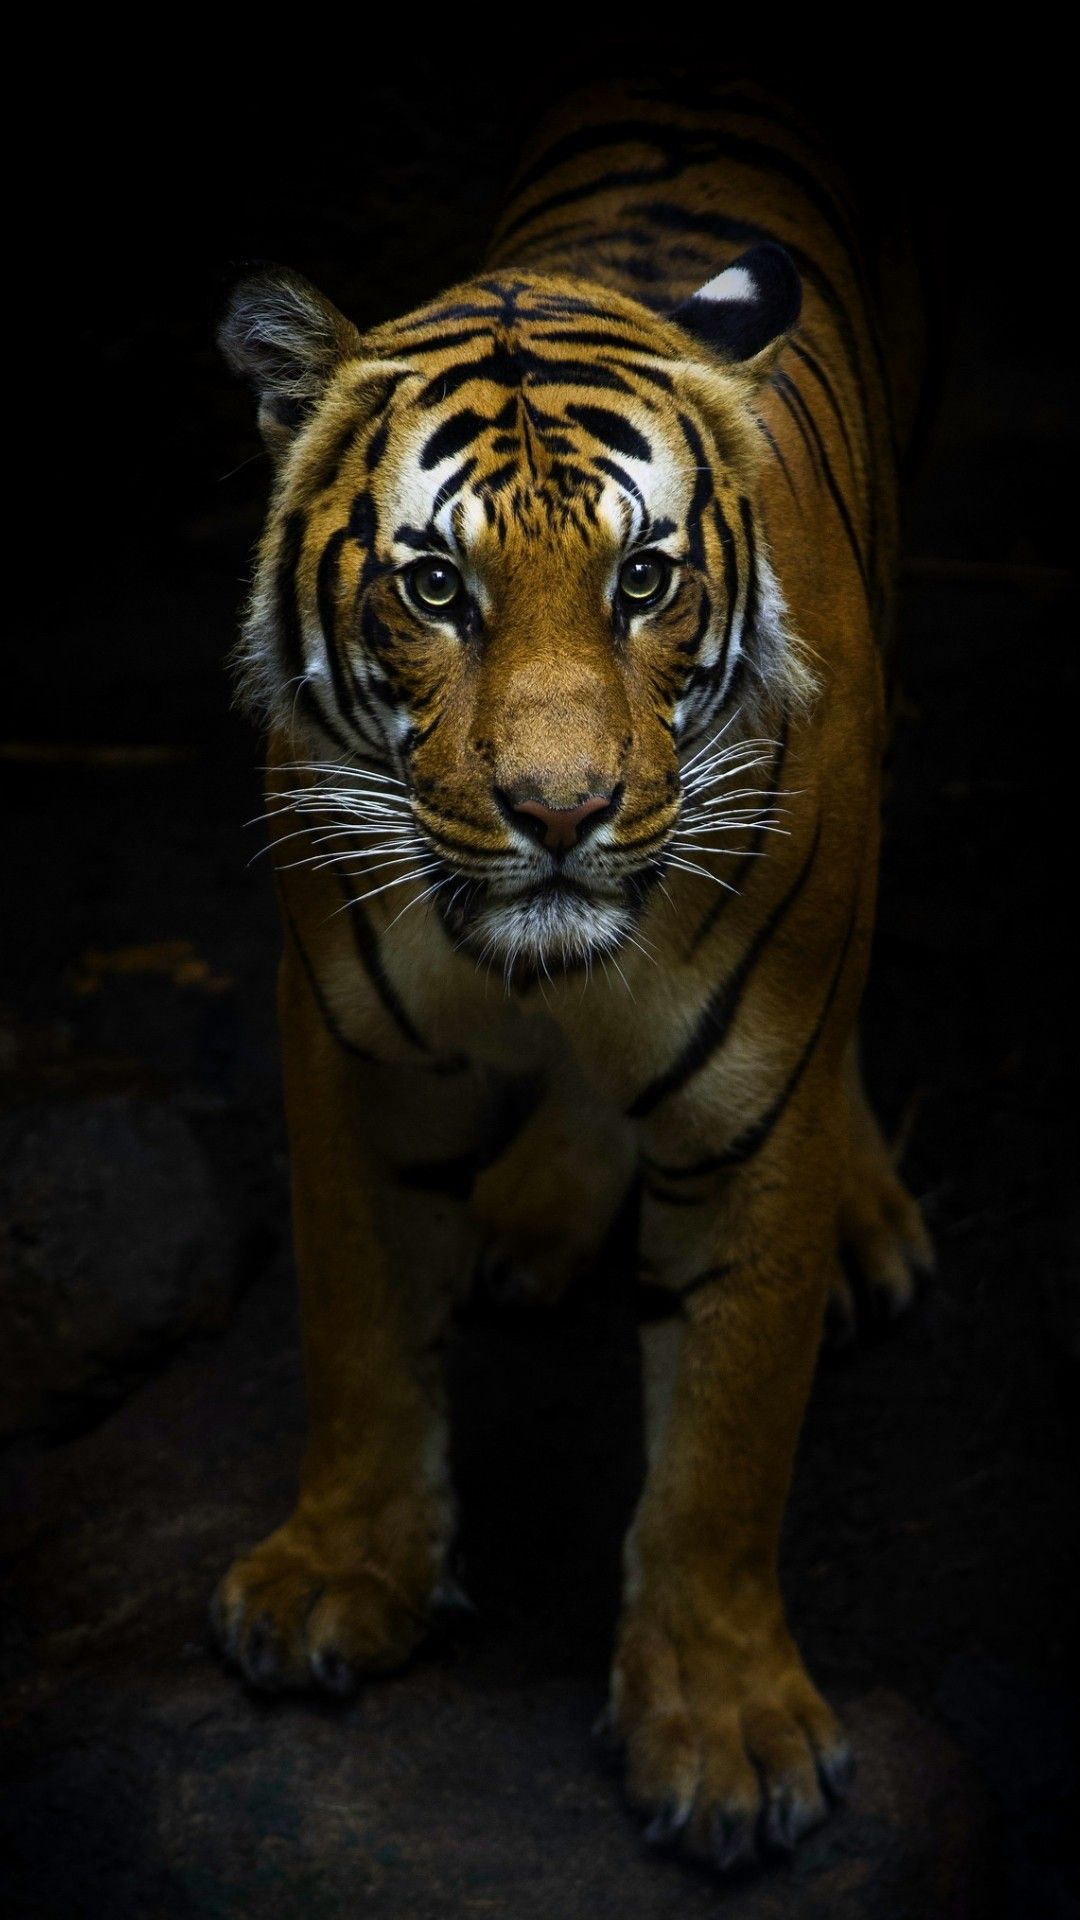 Pin by beredjiklian on nature in 2020 Big cats